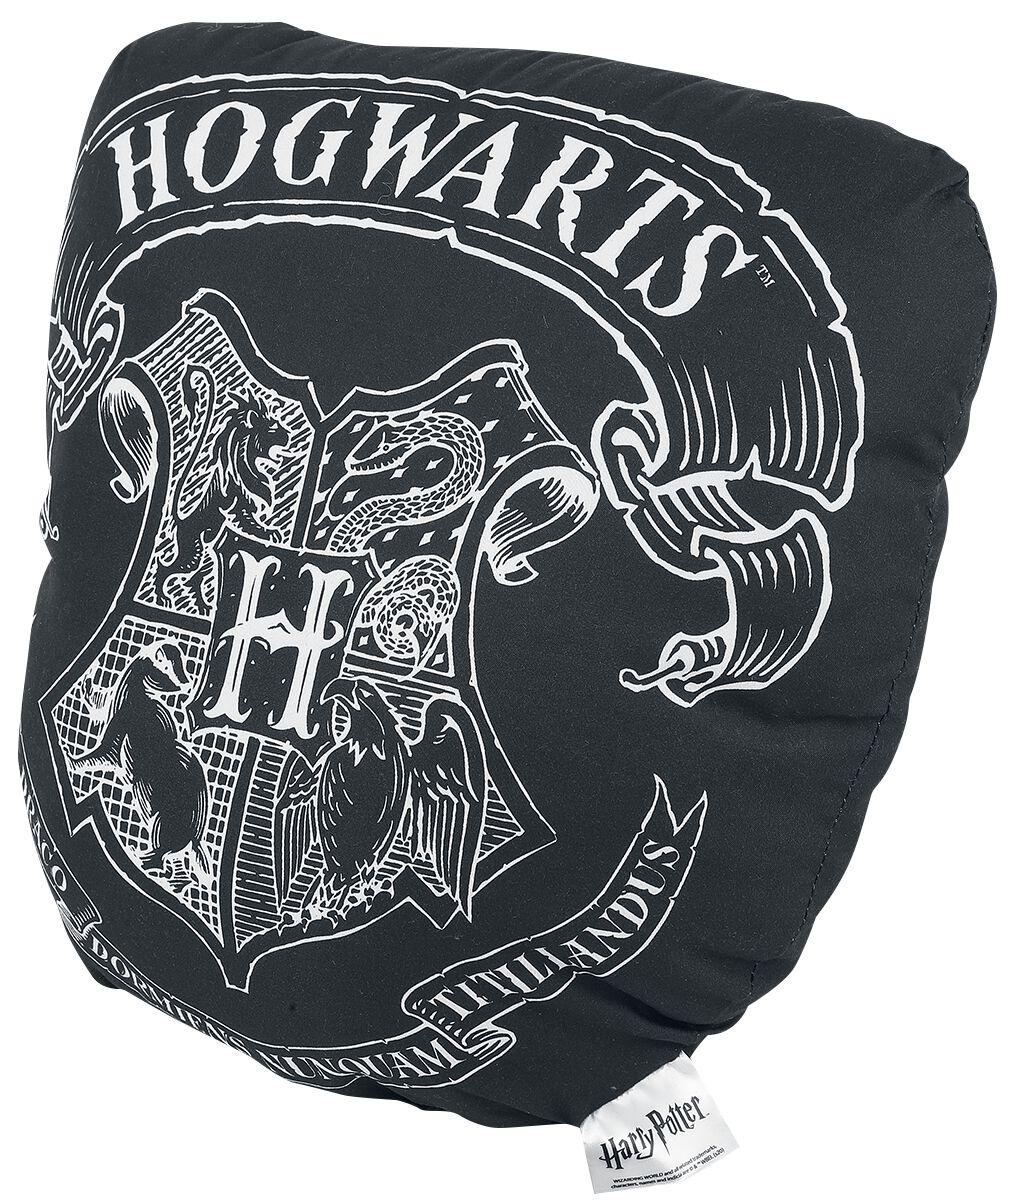 Harry Potter Hogwarts  Kissen  schwarz